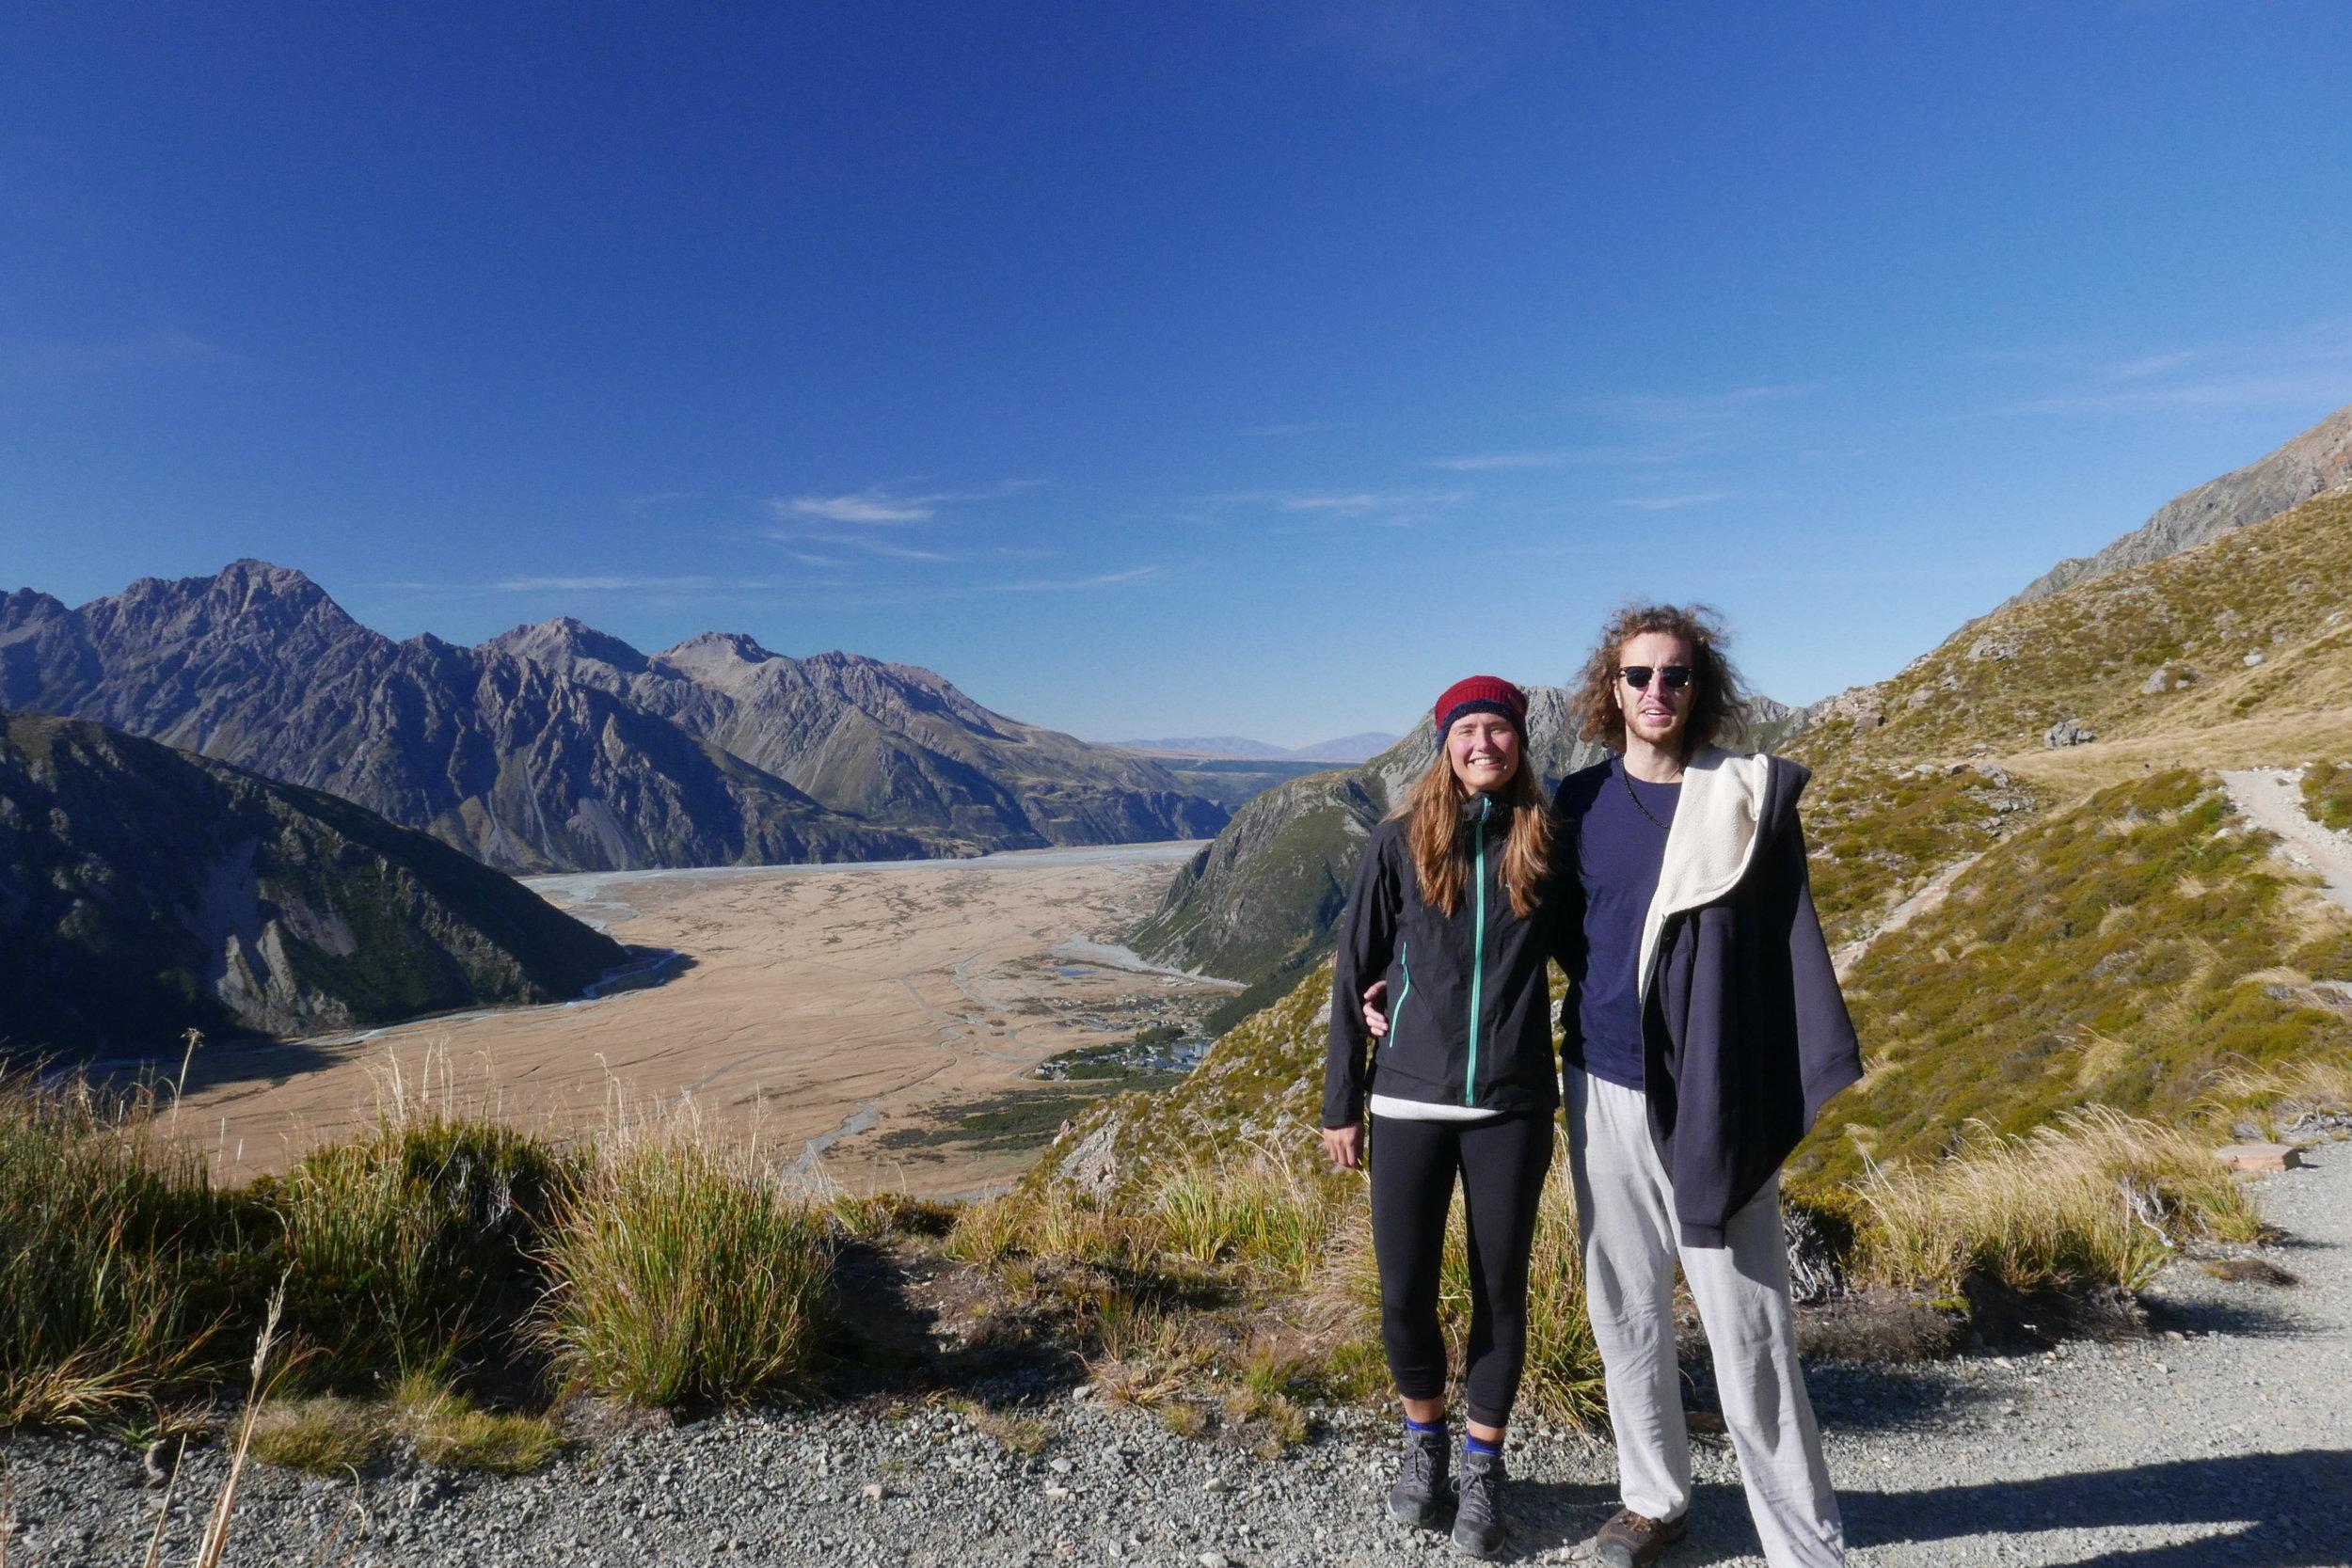 Above Mount Cook village